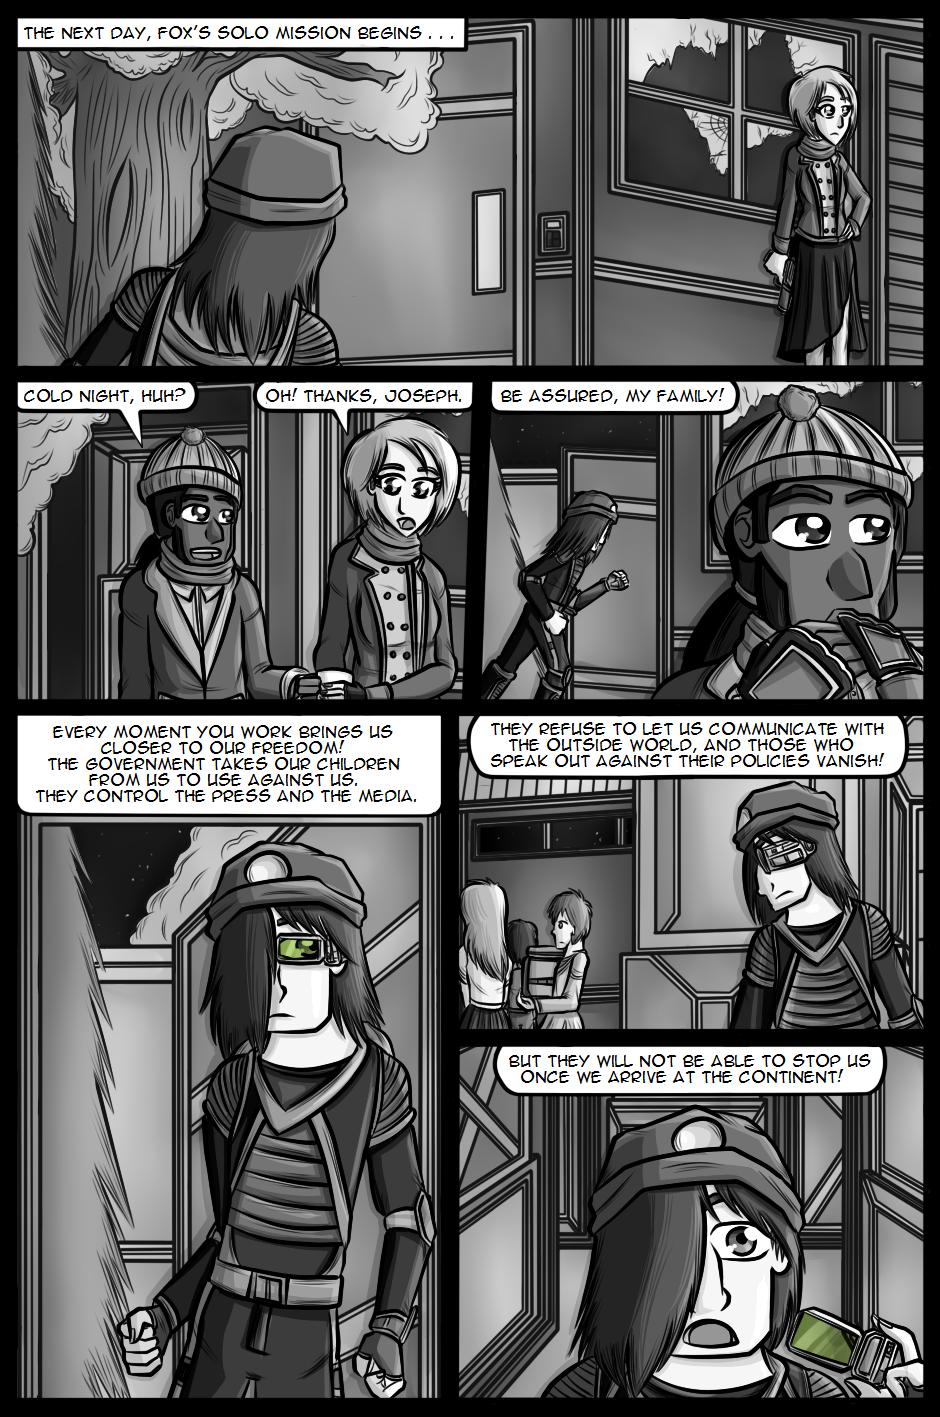 Fire Suppression, Part 11